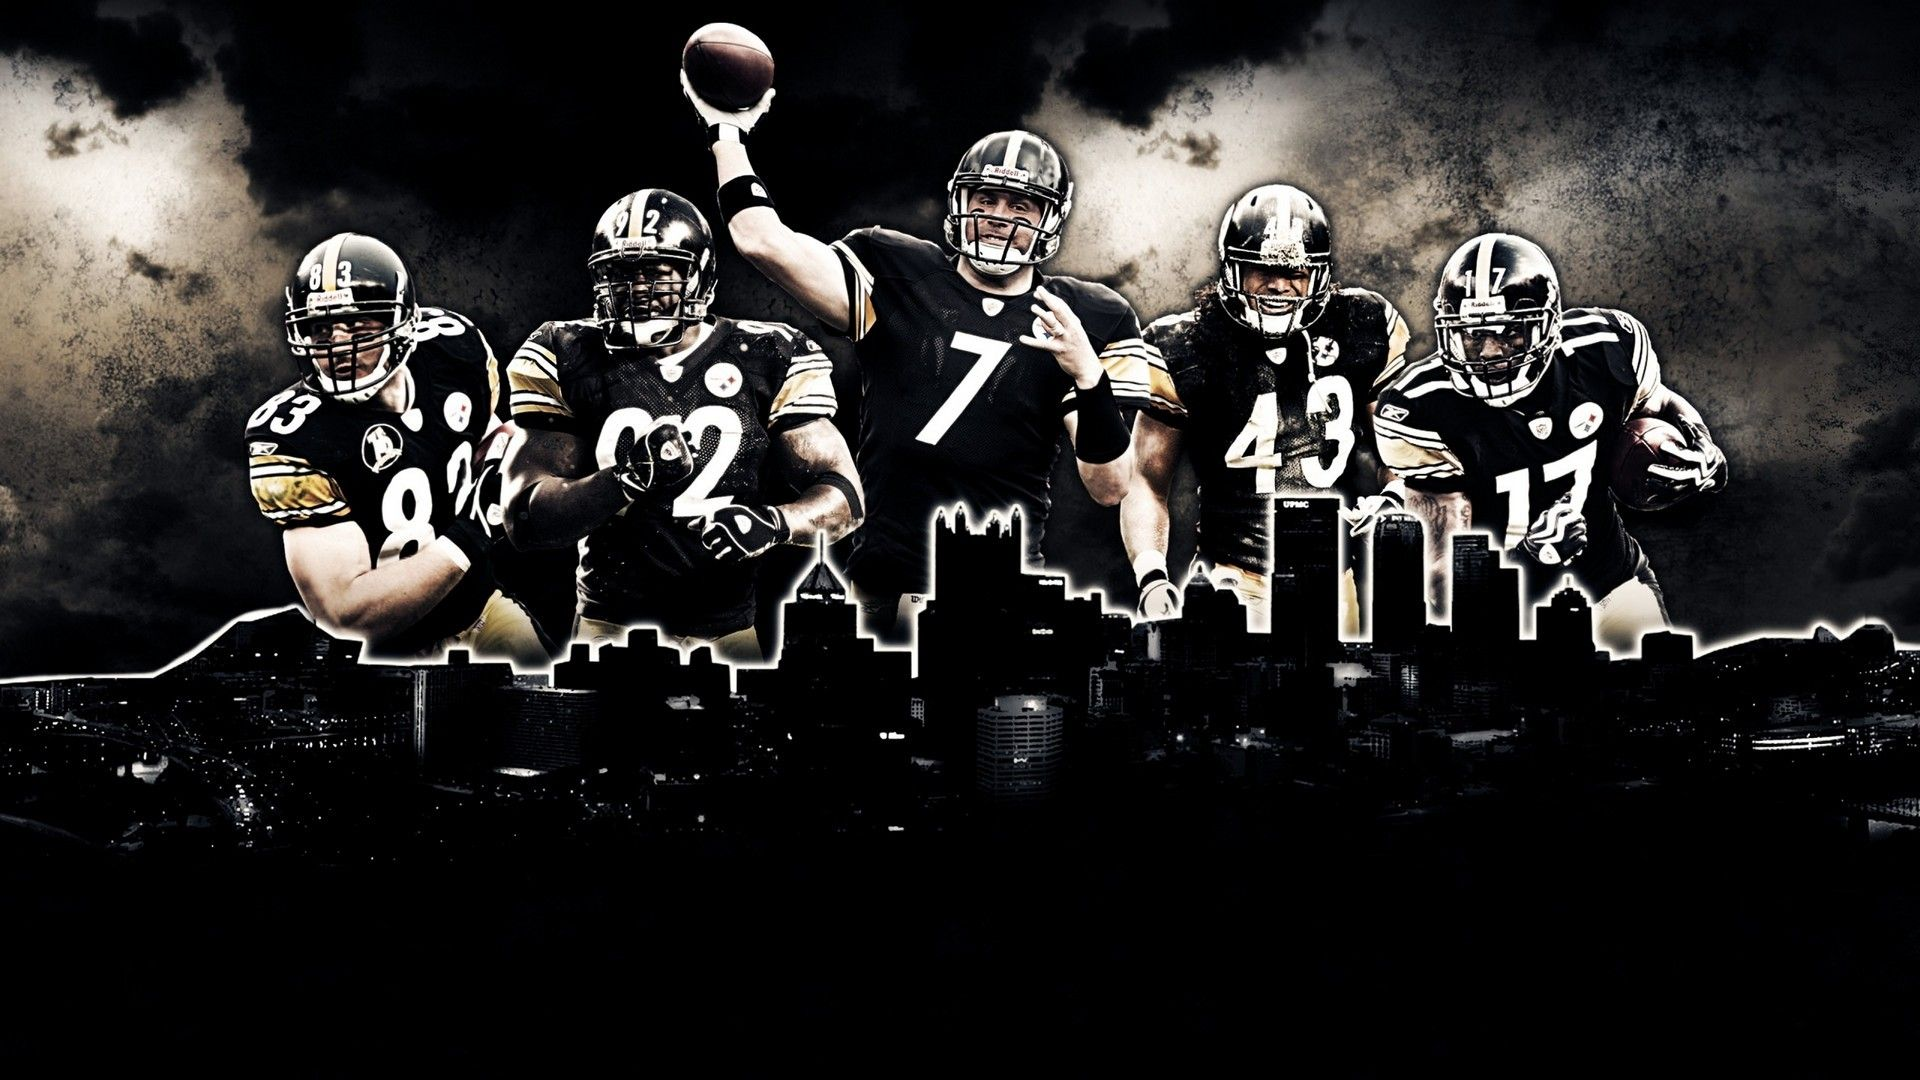 Nfl Wallpapers Nfl Football Wallpaper Pittsburgh Steelers Wallpaper Football Wallpaper